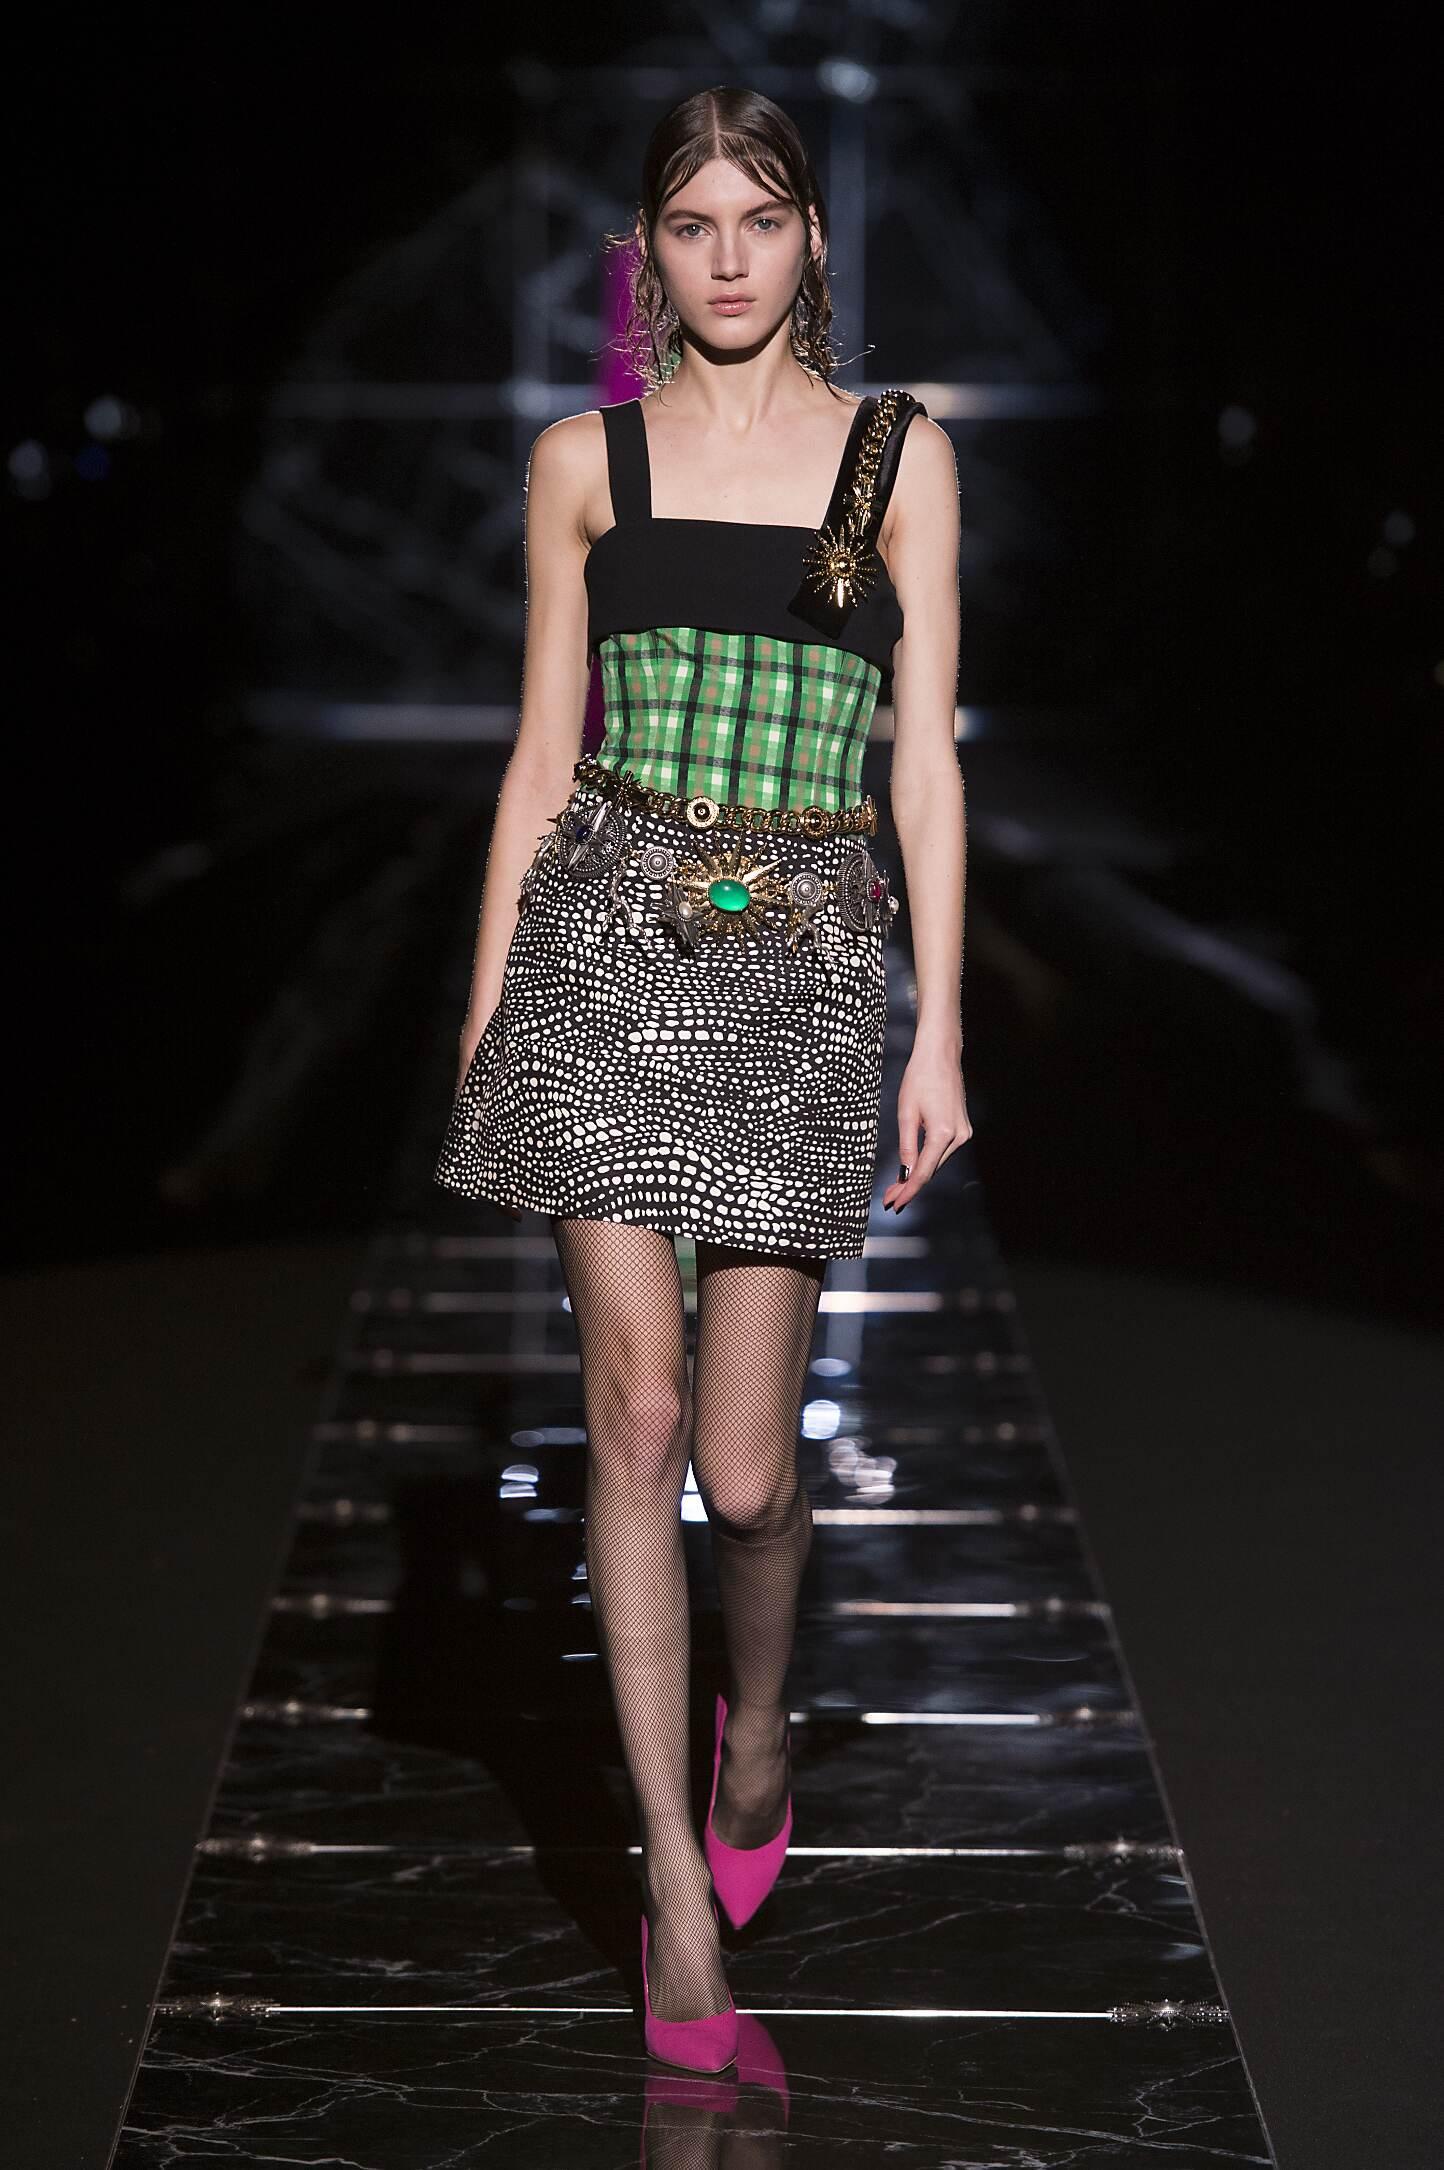 Fausto Puglisi Fall Winter 2015 16 Womenswear Collection Milan Fashion Week Fashion Show